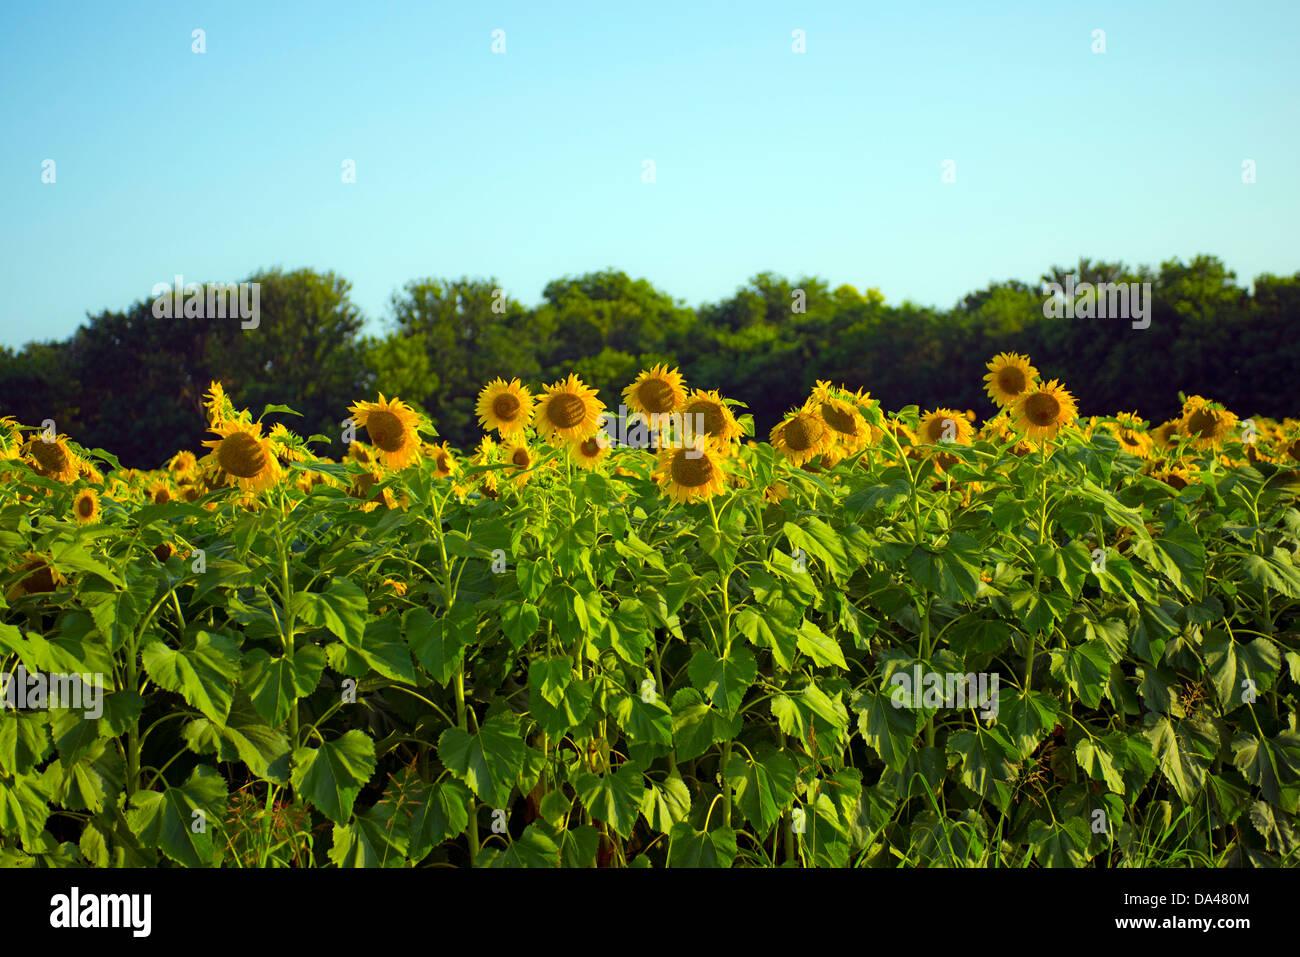 Sunflowers in Texas Sunshine - Stock Image